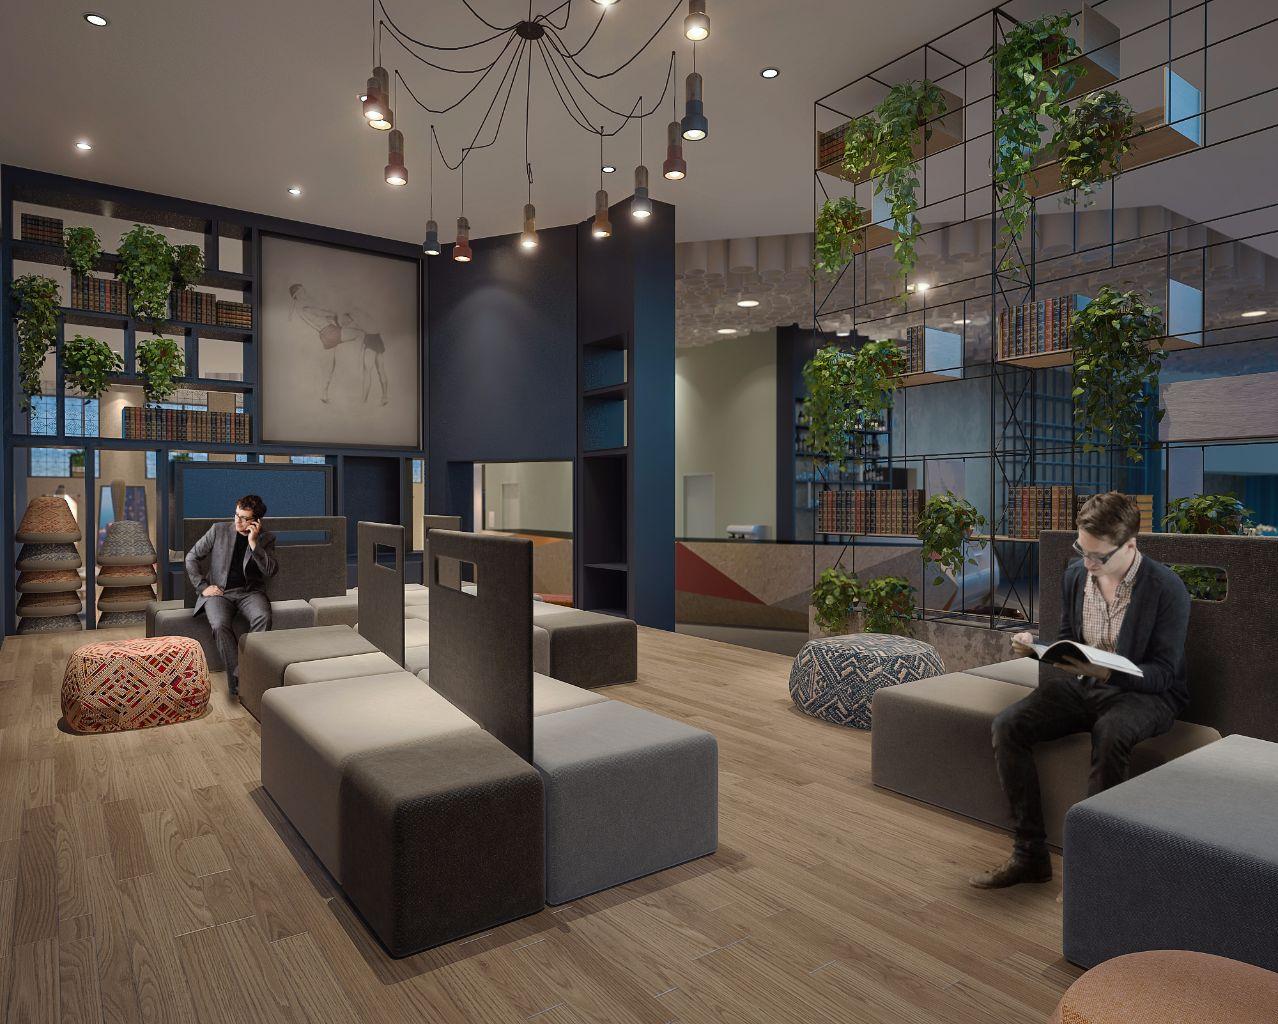 Ibis Hotel Competition - Hotel Design Project | GEMA Architecture